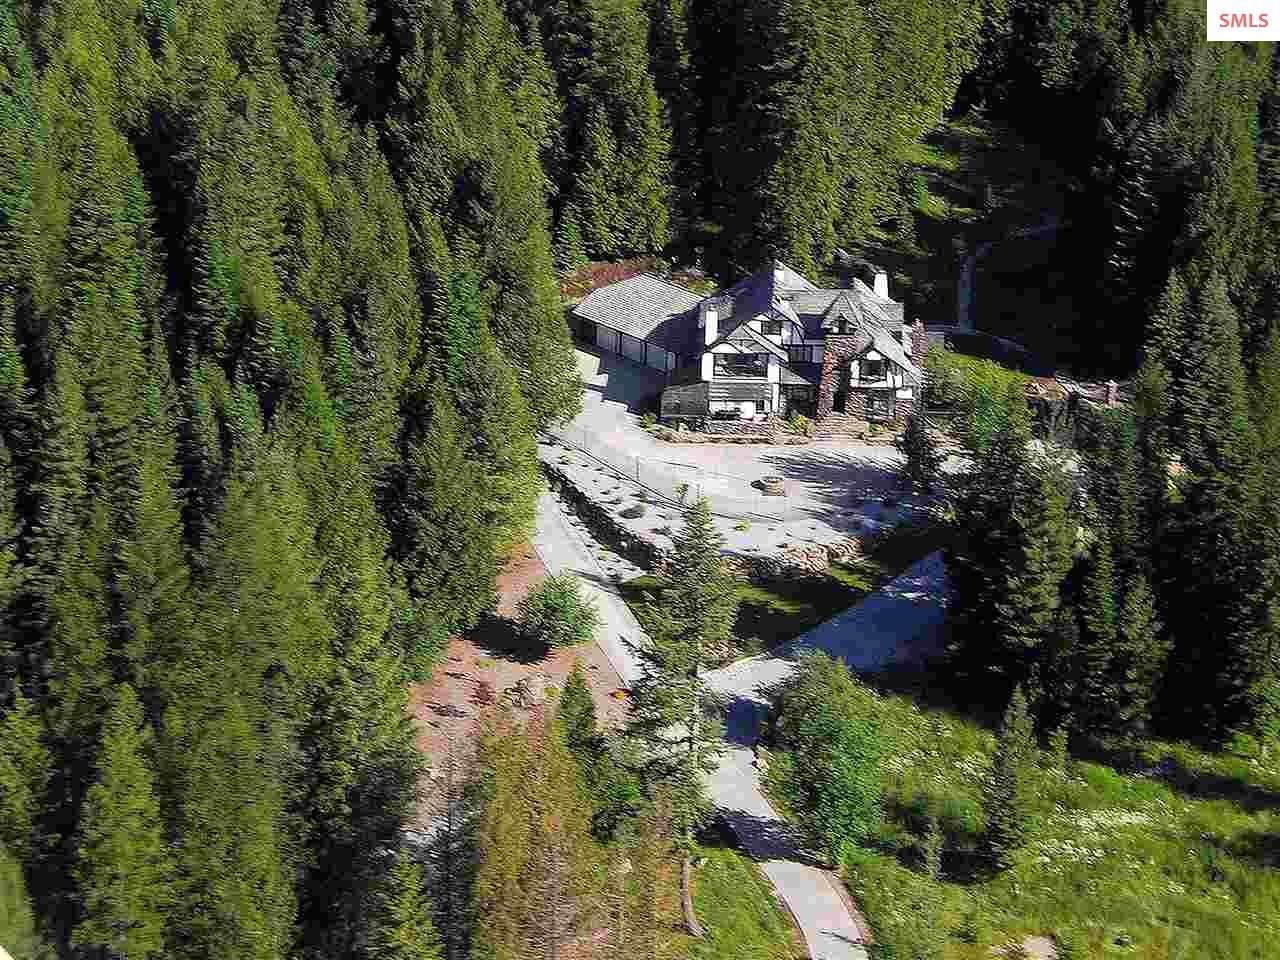 Single Family Home for Sale at 612 Goa Way 612 Goa Way Priest River, Idaho 83856 United States